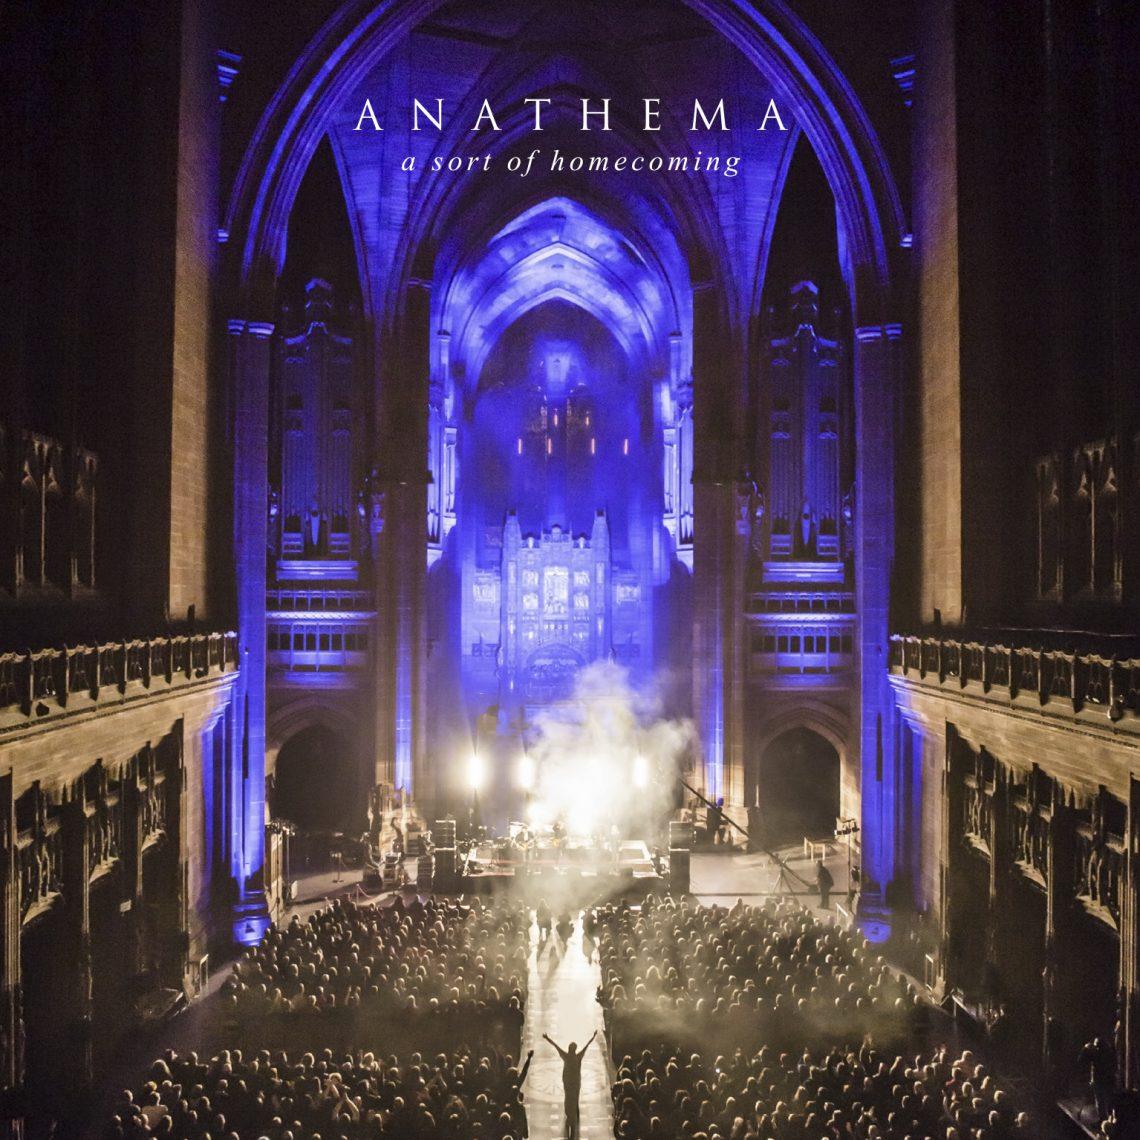 Anathema line-up Autumn tour to road test new music